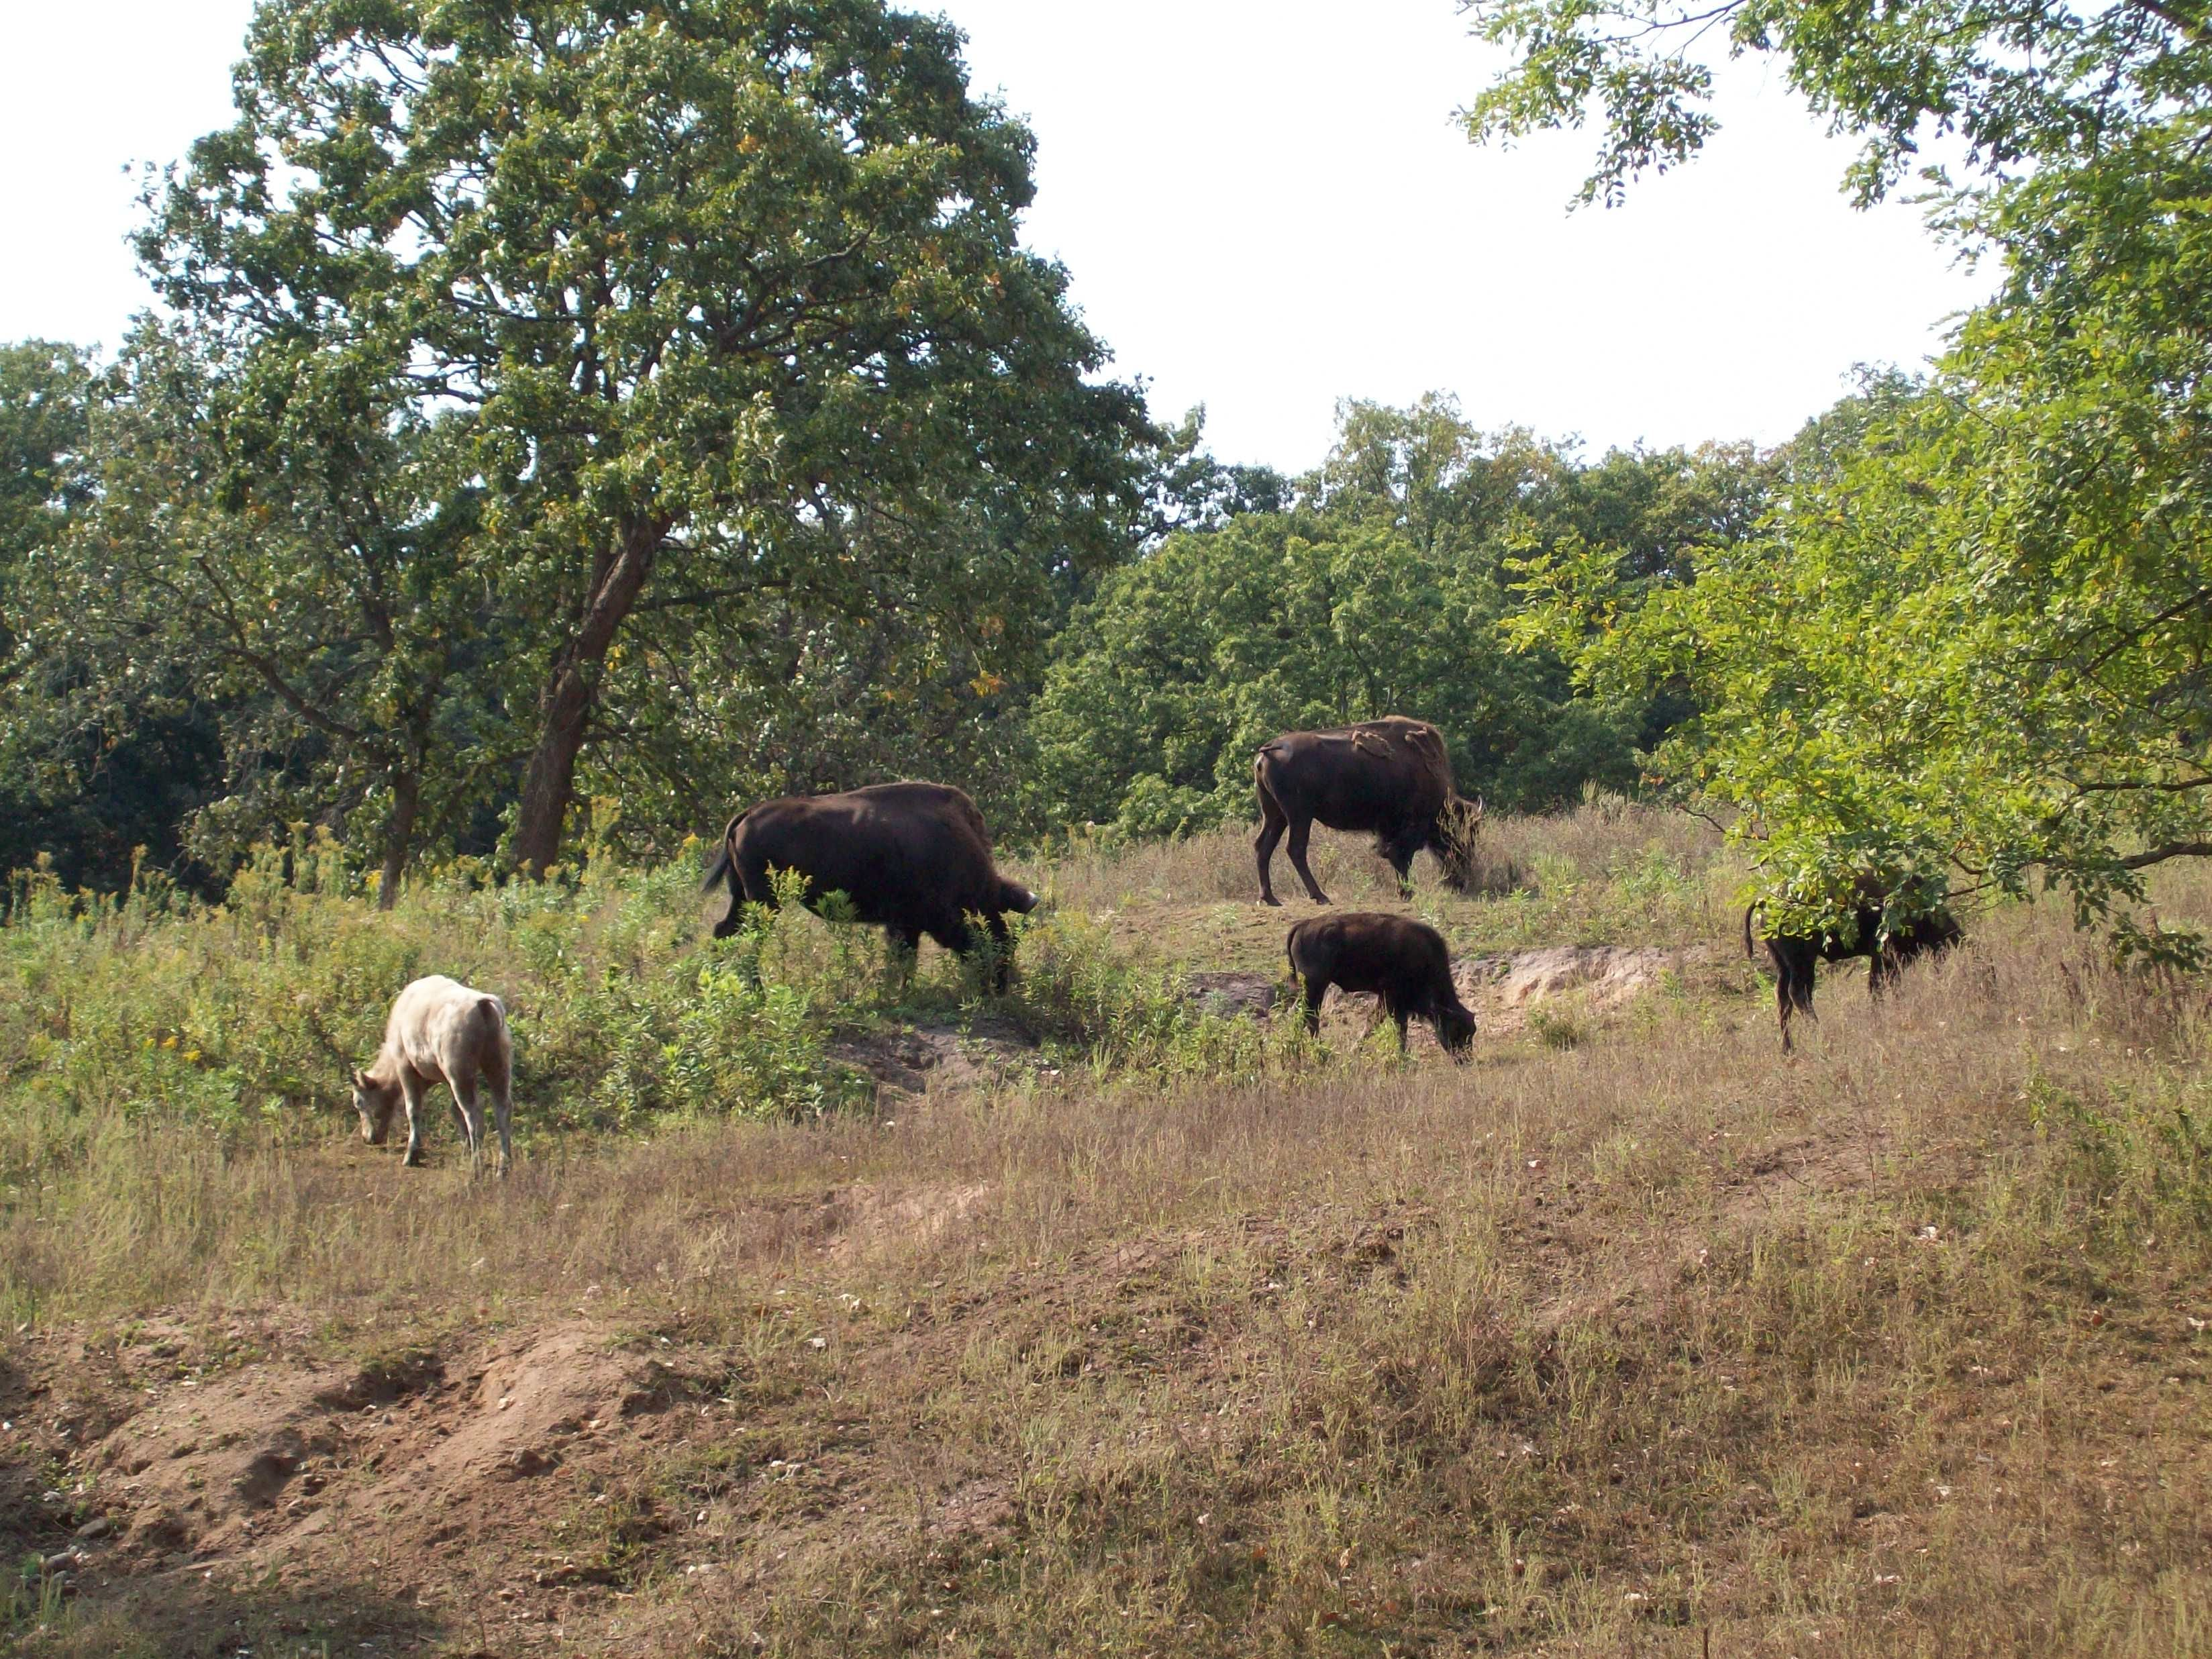 Bison at irvine park irvine park lake girl chippewa falls